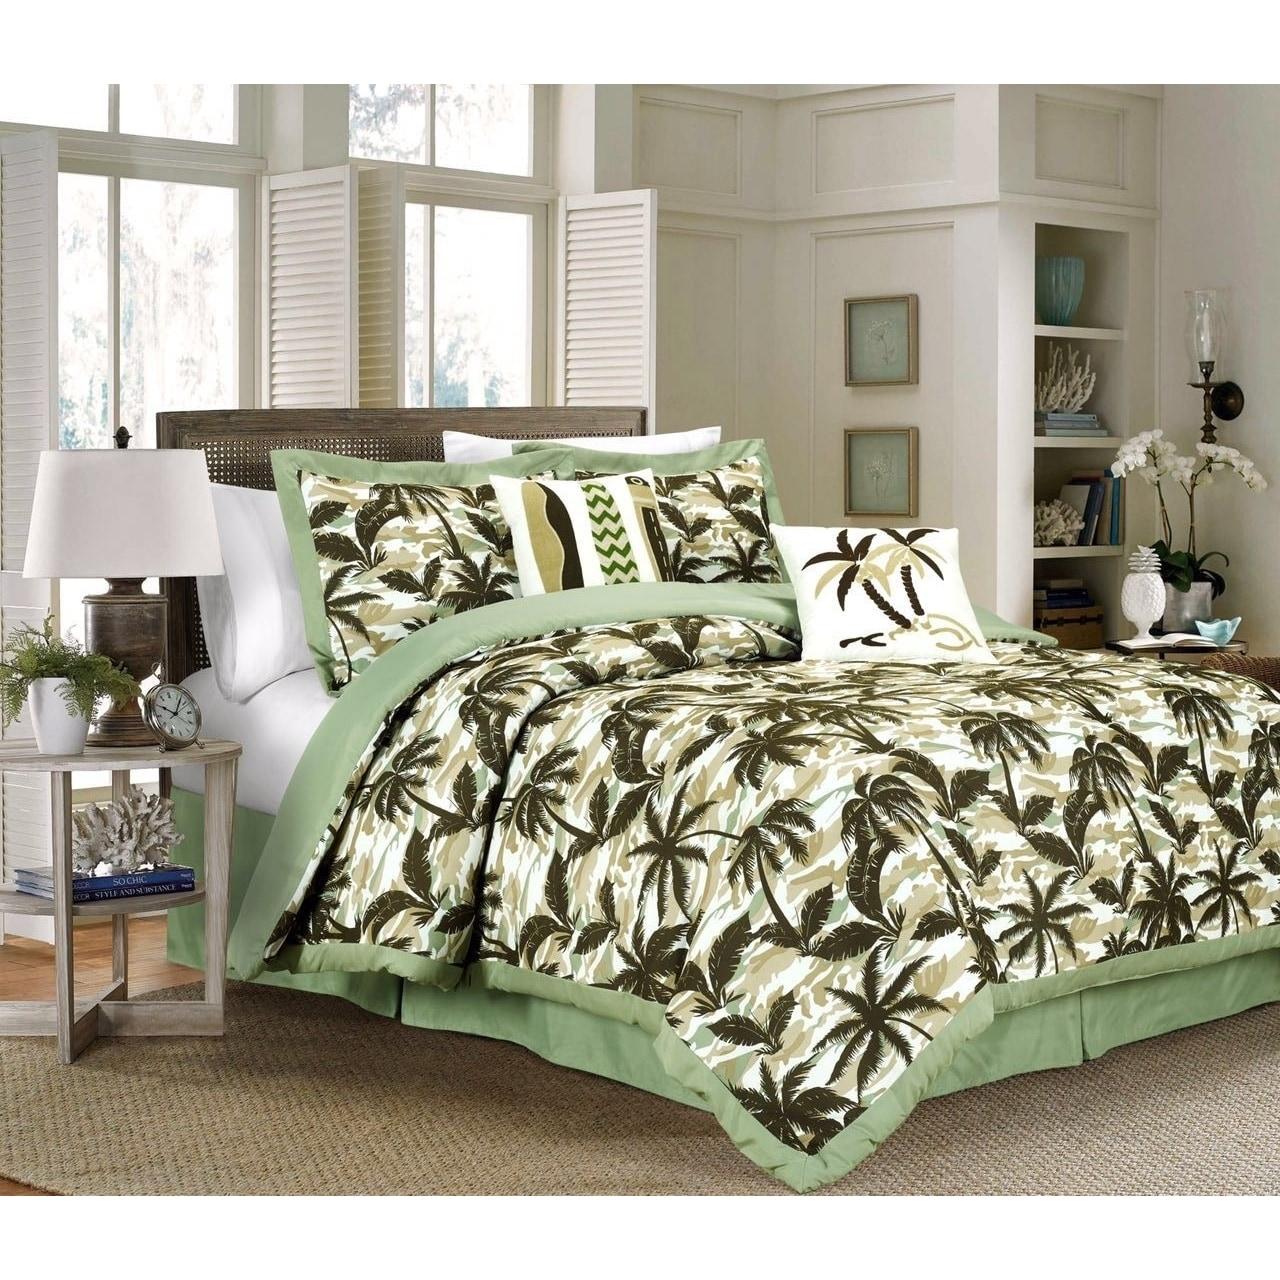 King Queen Beautiful Tropical Palm Leaf Green Sage Brown Comforter Set Cal Home Garden Comforters Bedding Sets